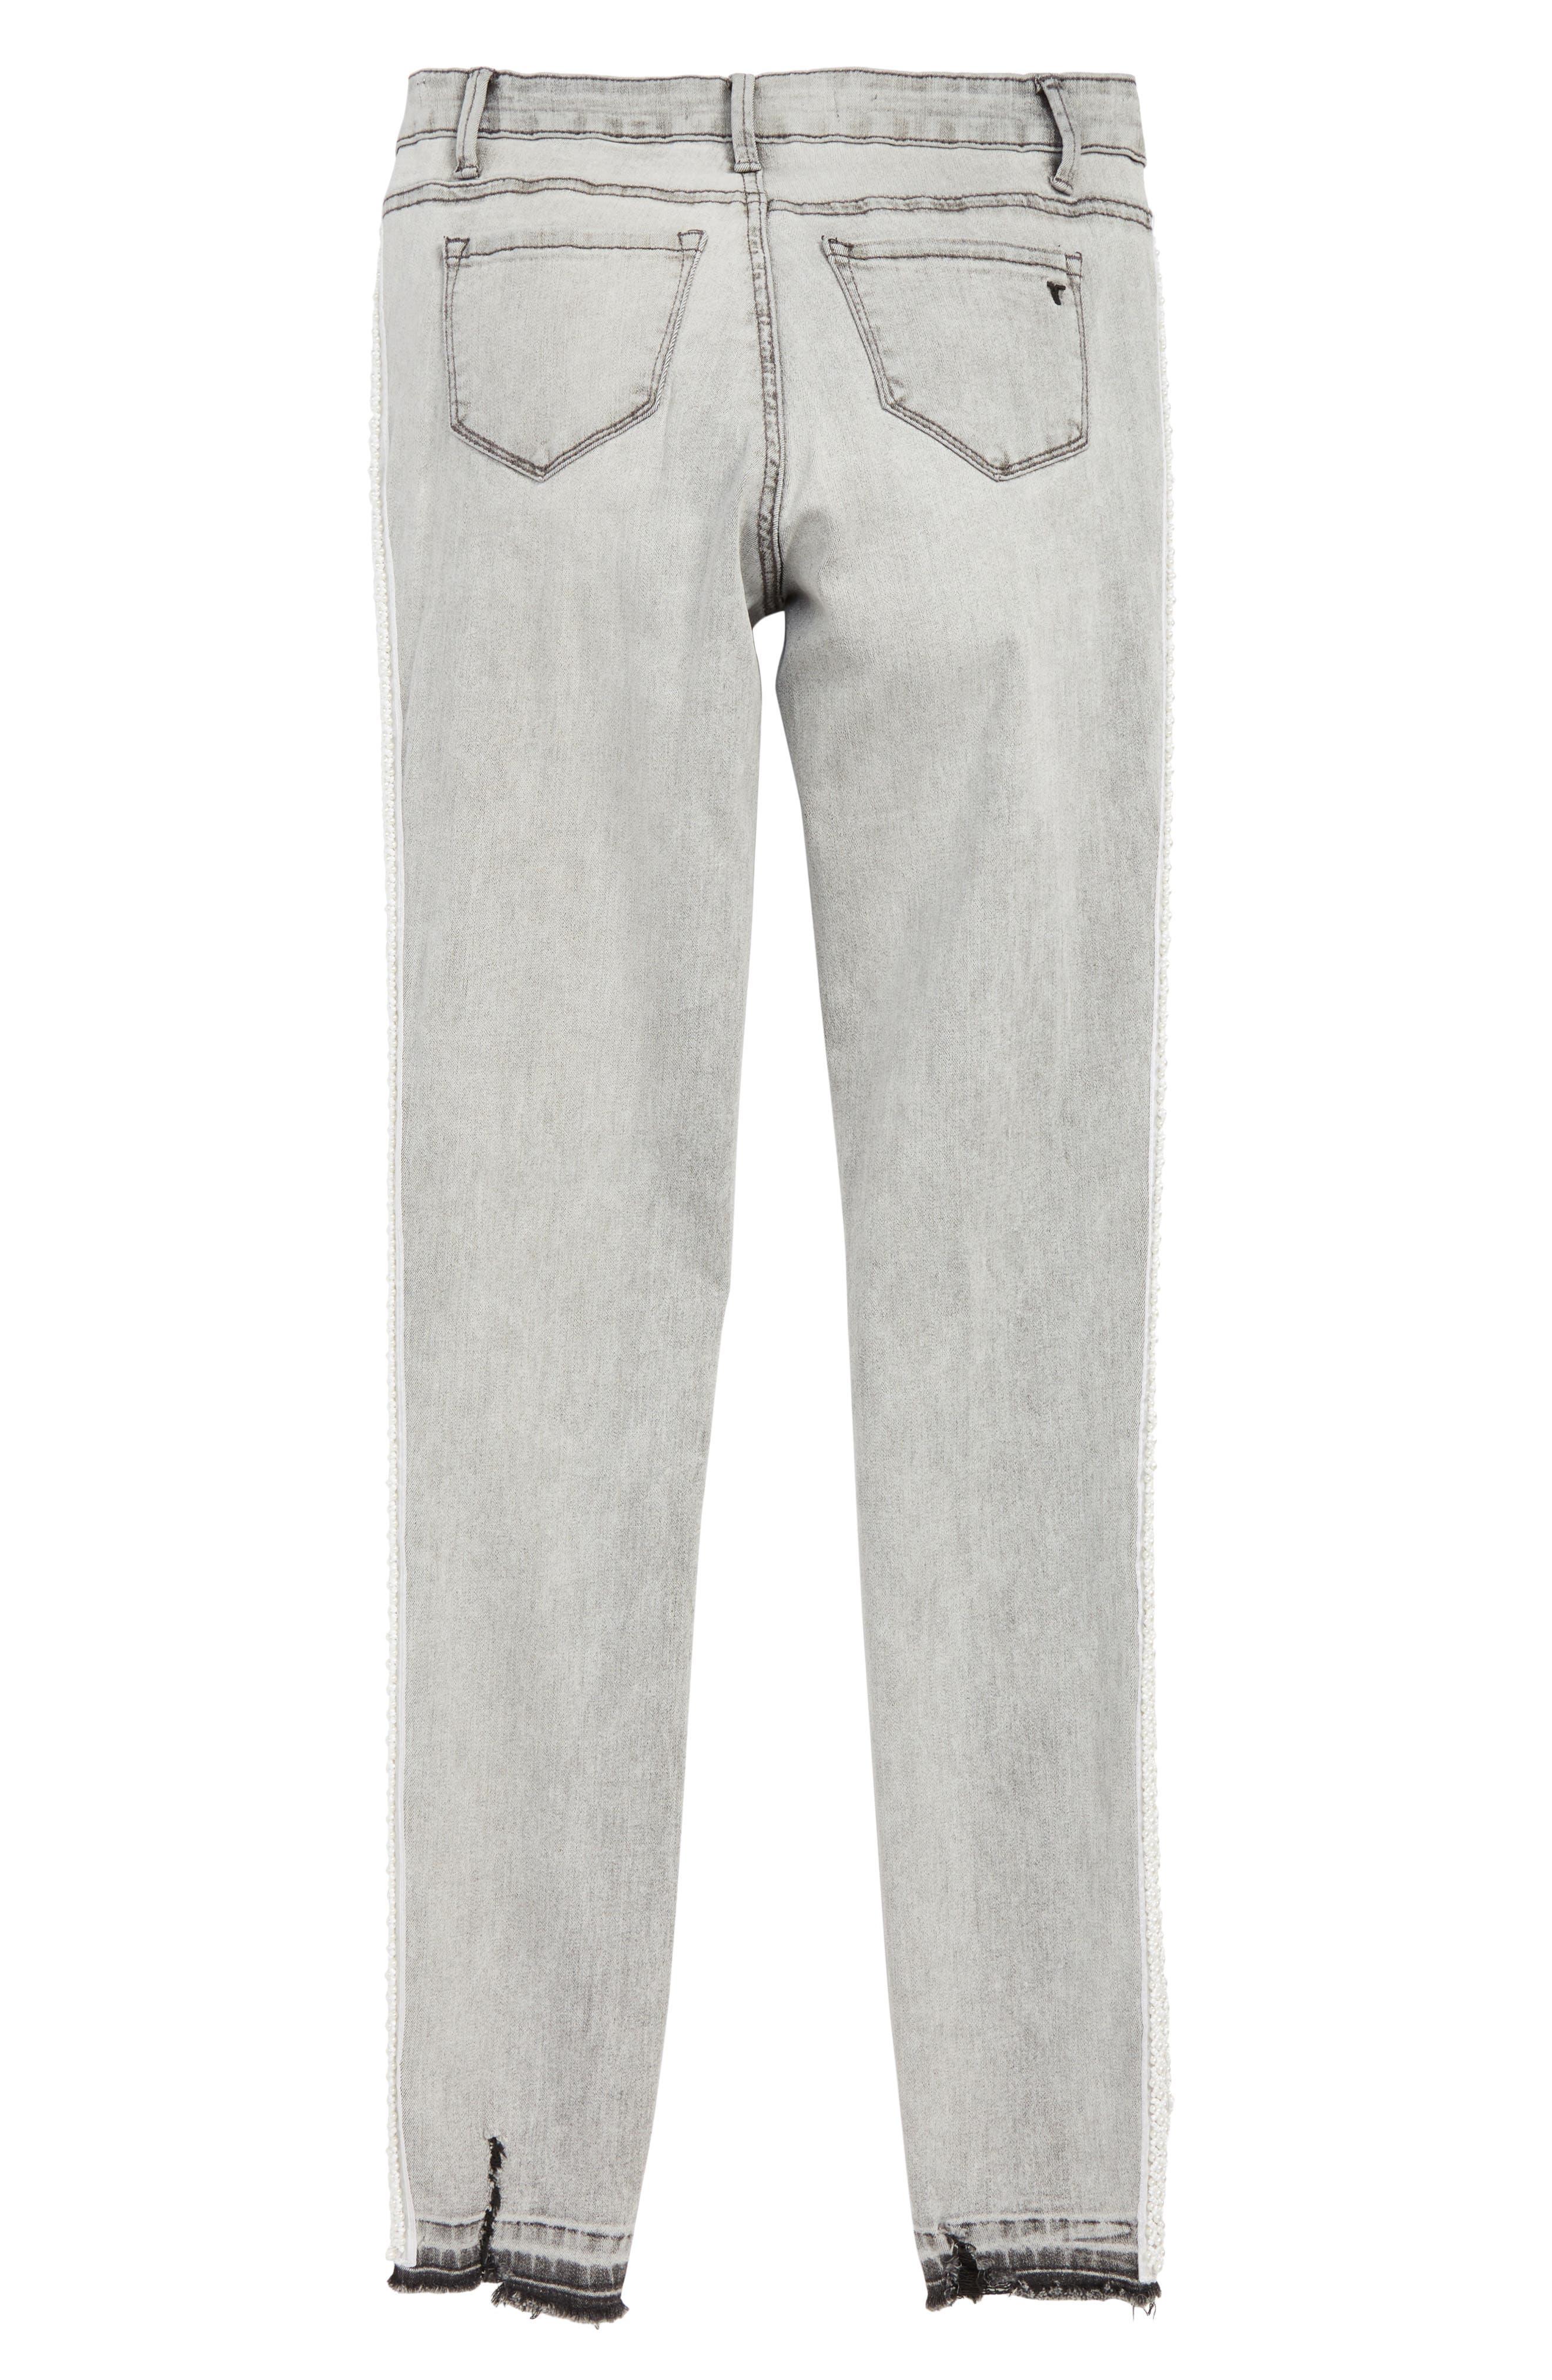 Embellished Tuxedo Stripe Skinny Jeans,                             Alternate thumbnail 2, color,                             CHARCOAL